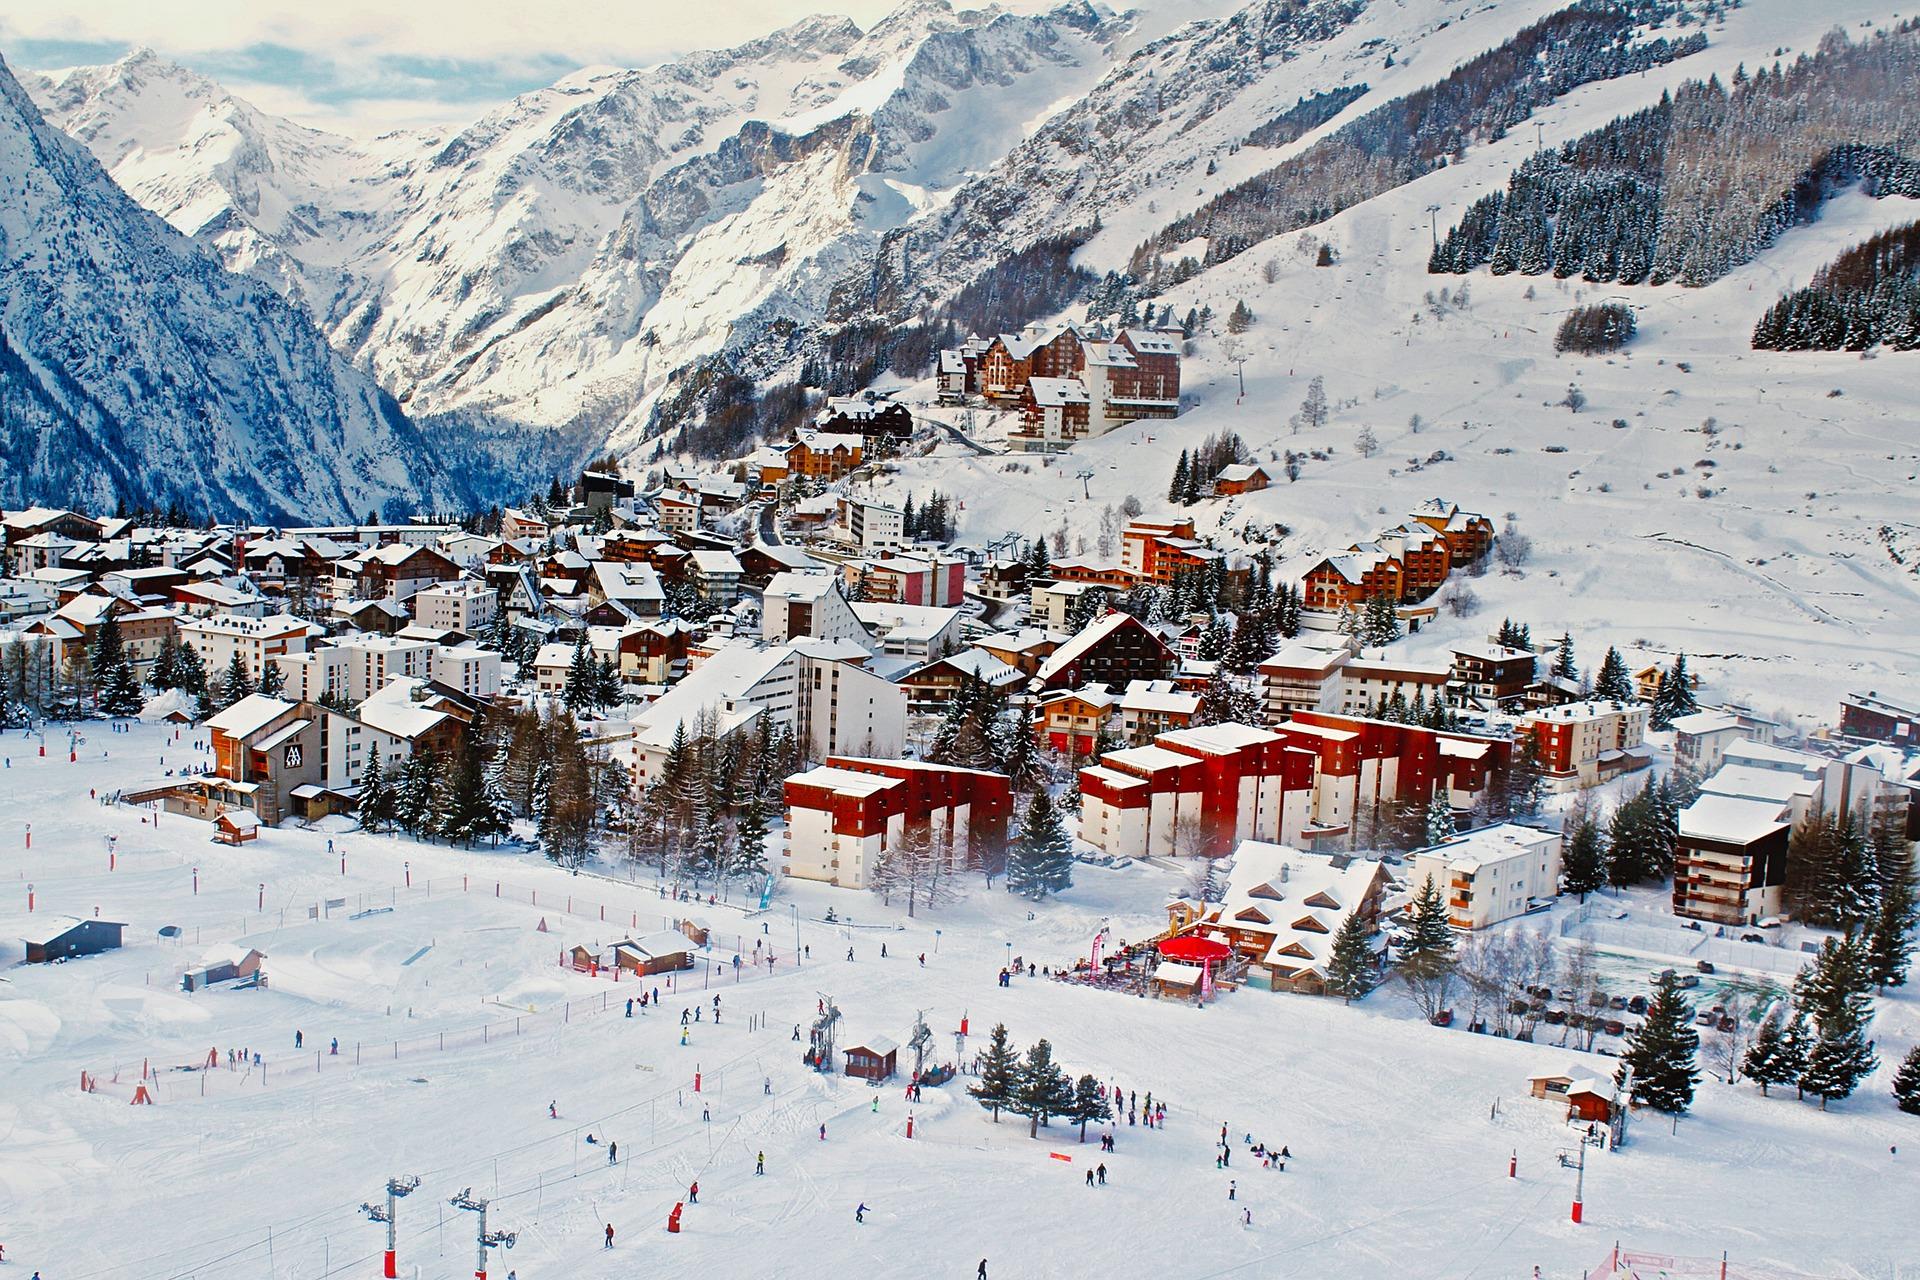 france skiing ski resort town pixabay